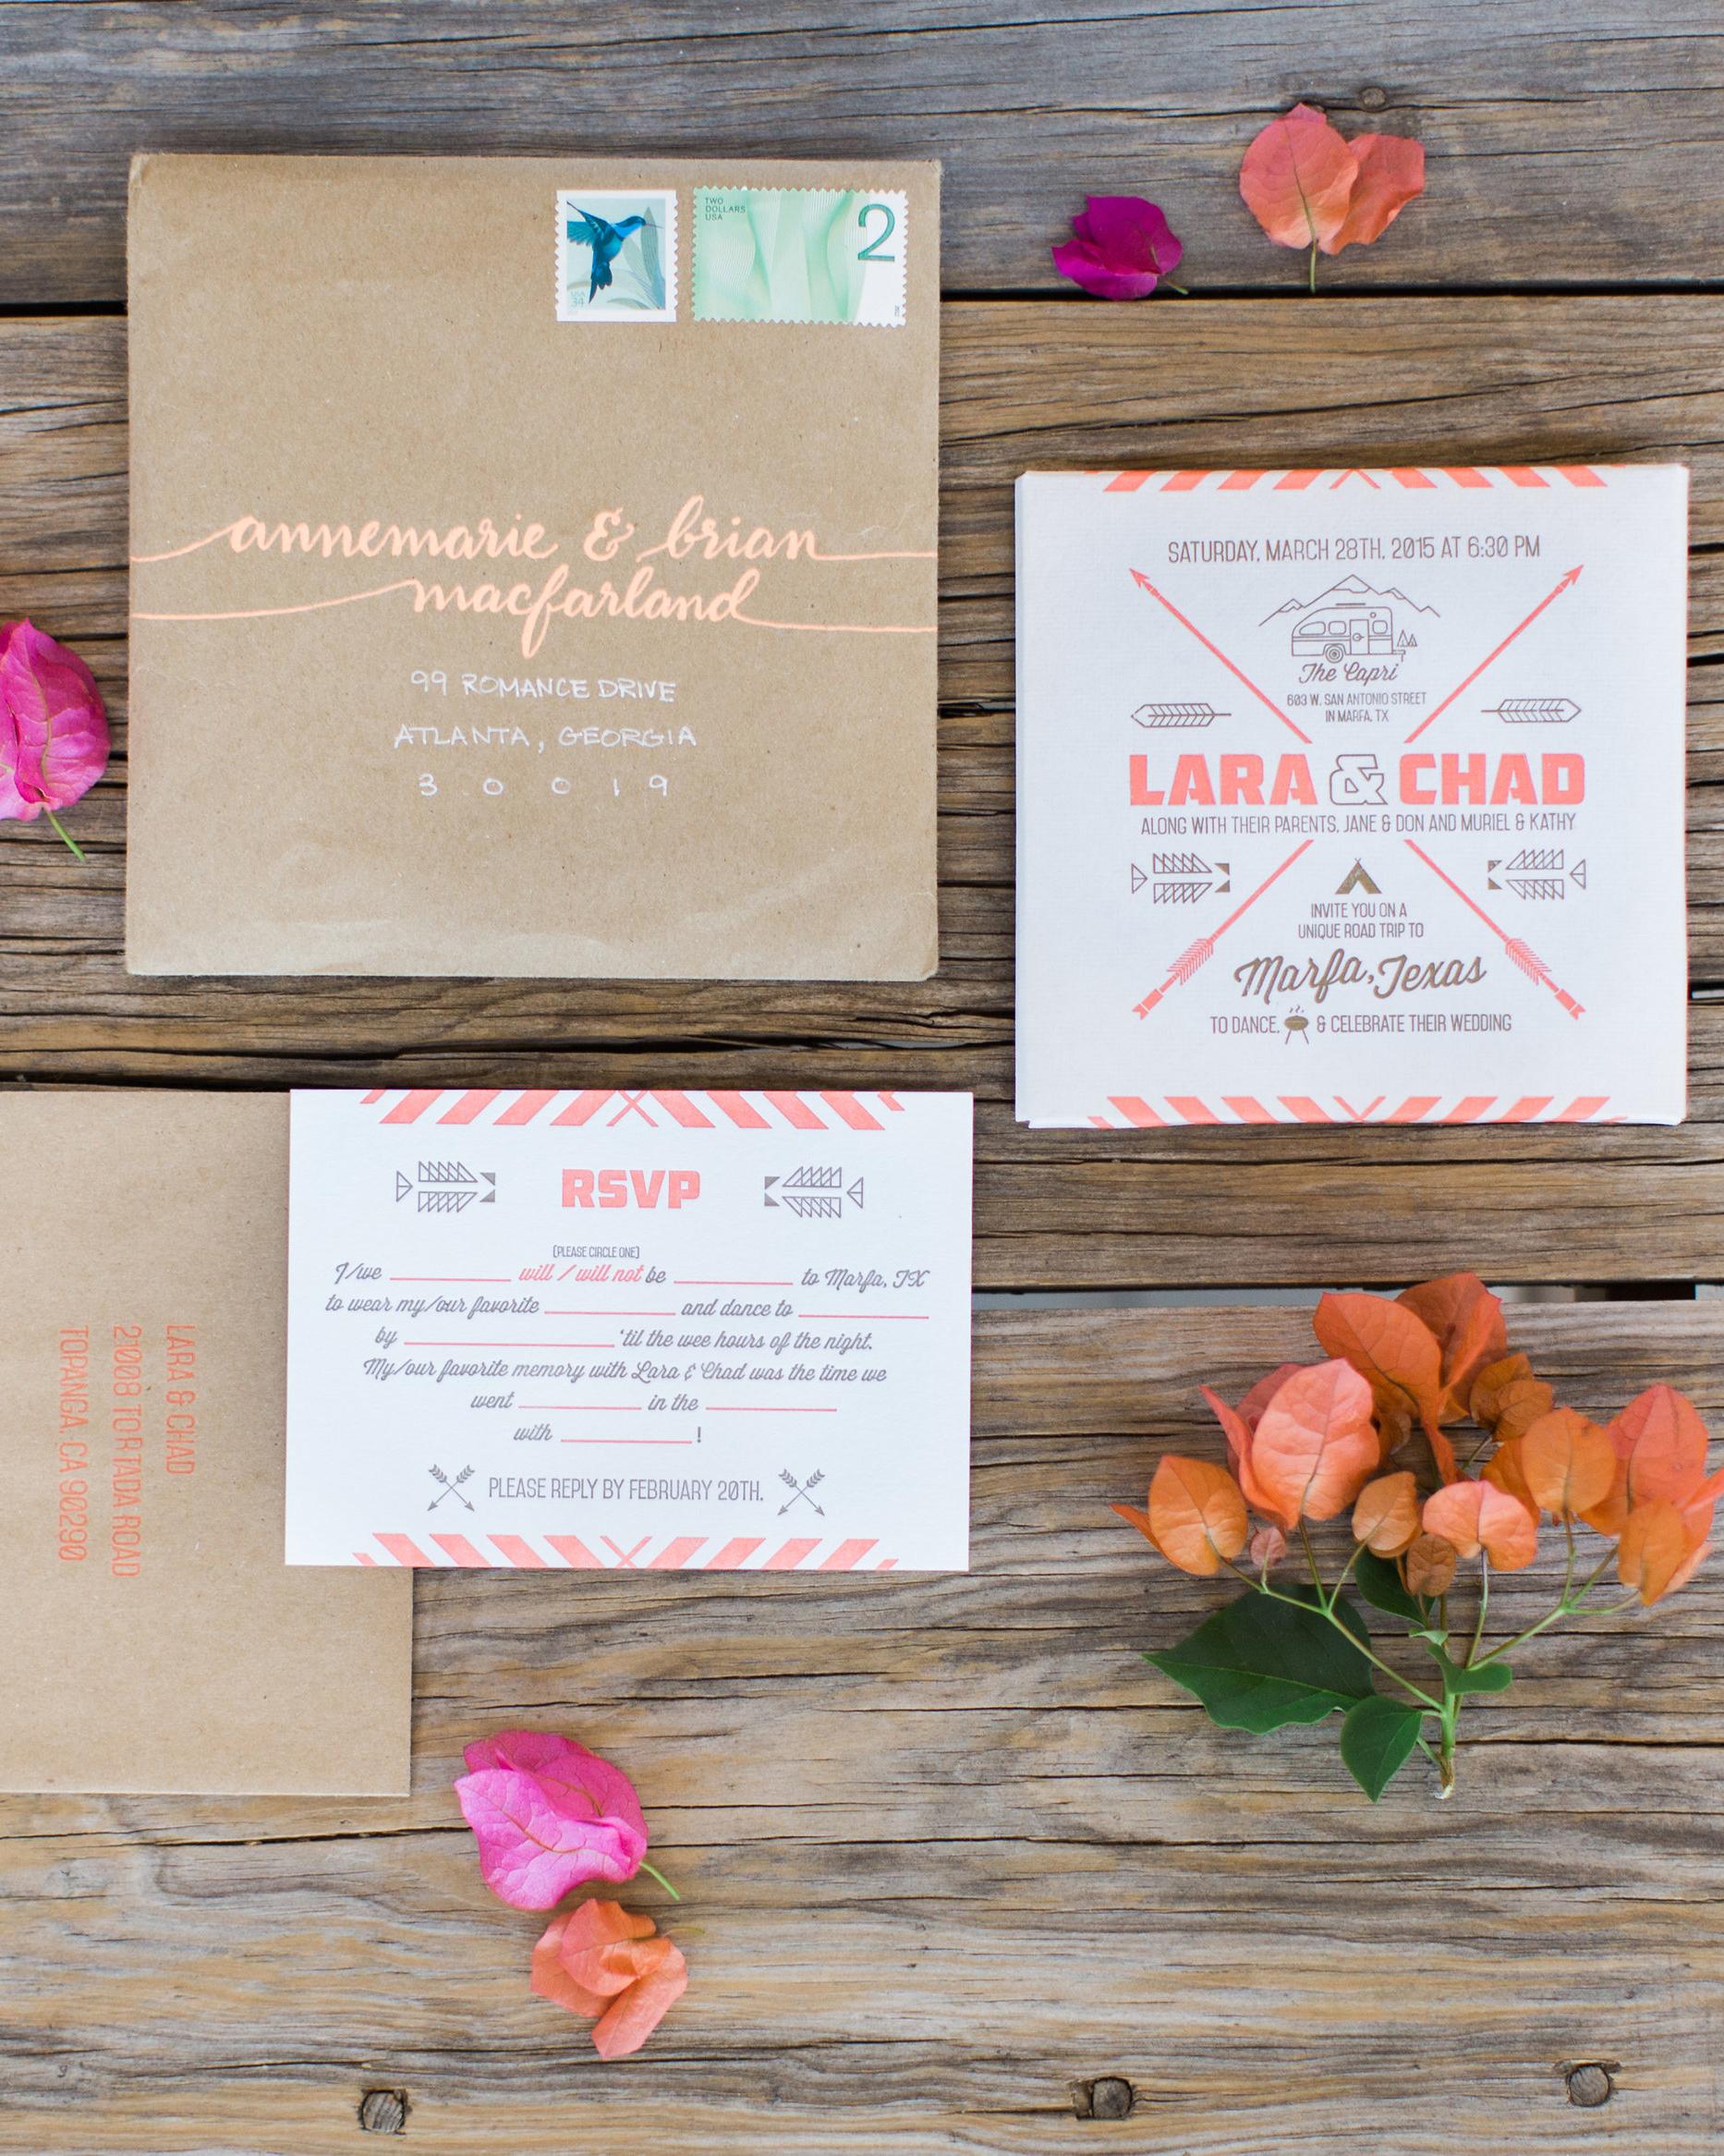 lara-chad-wedding-invite-001-s112306-1115.jpg